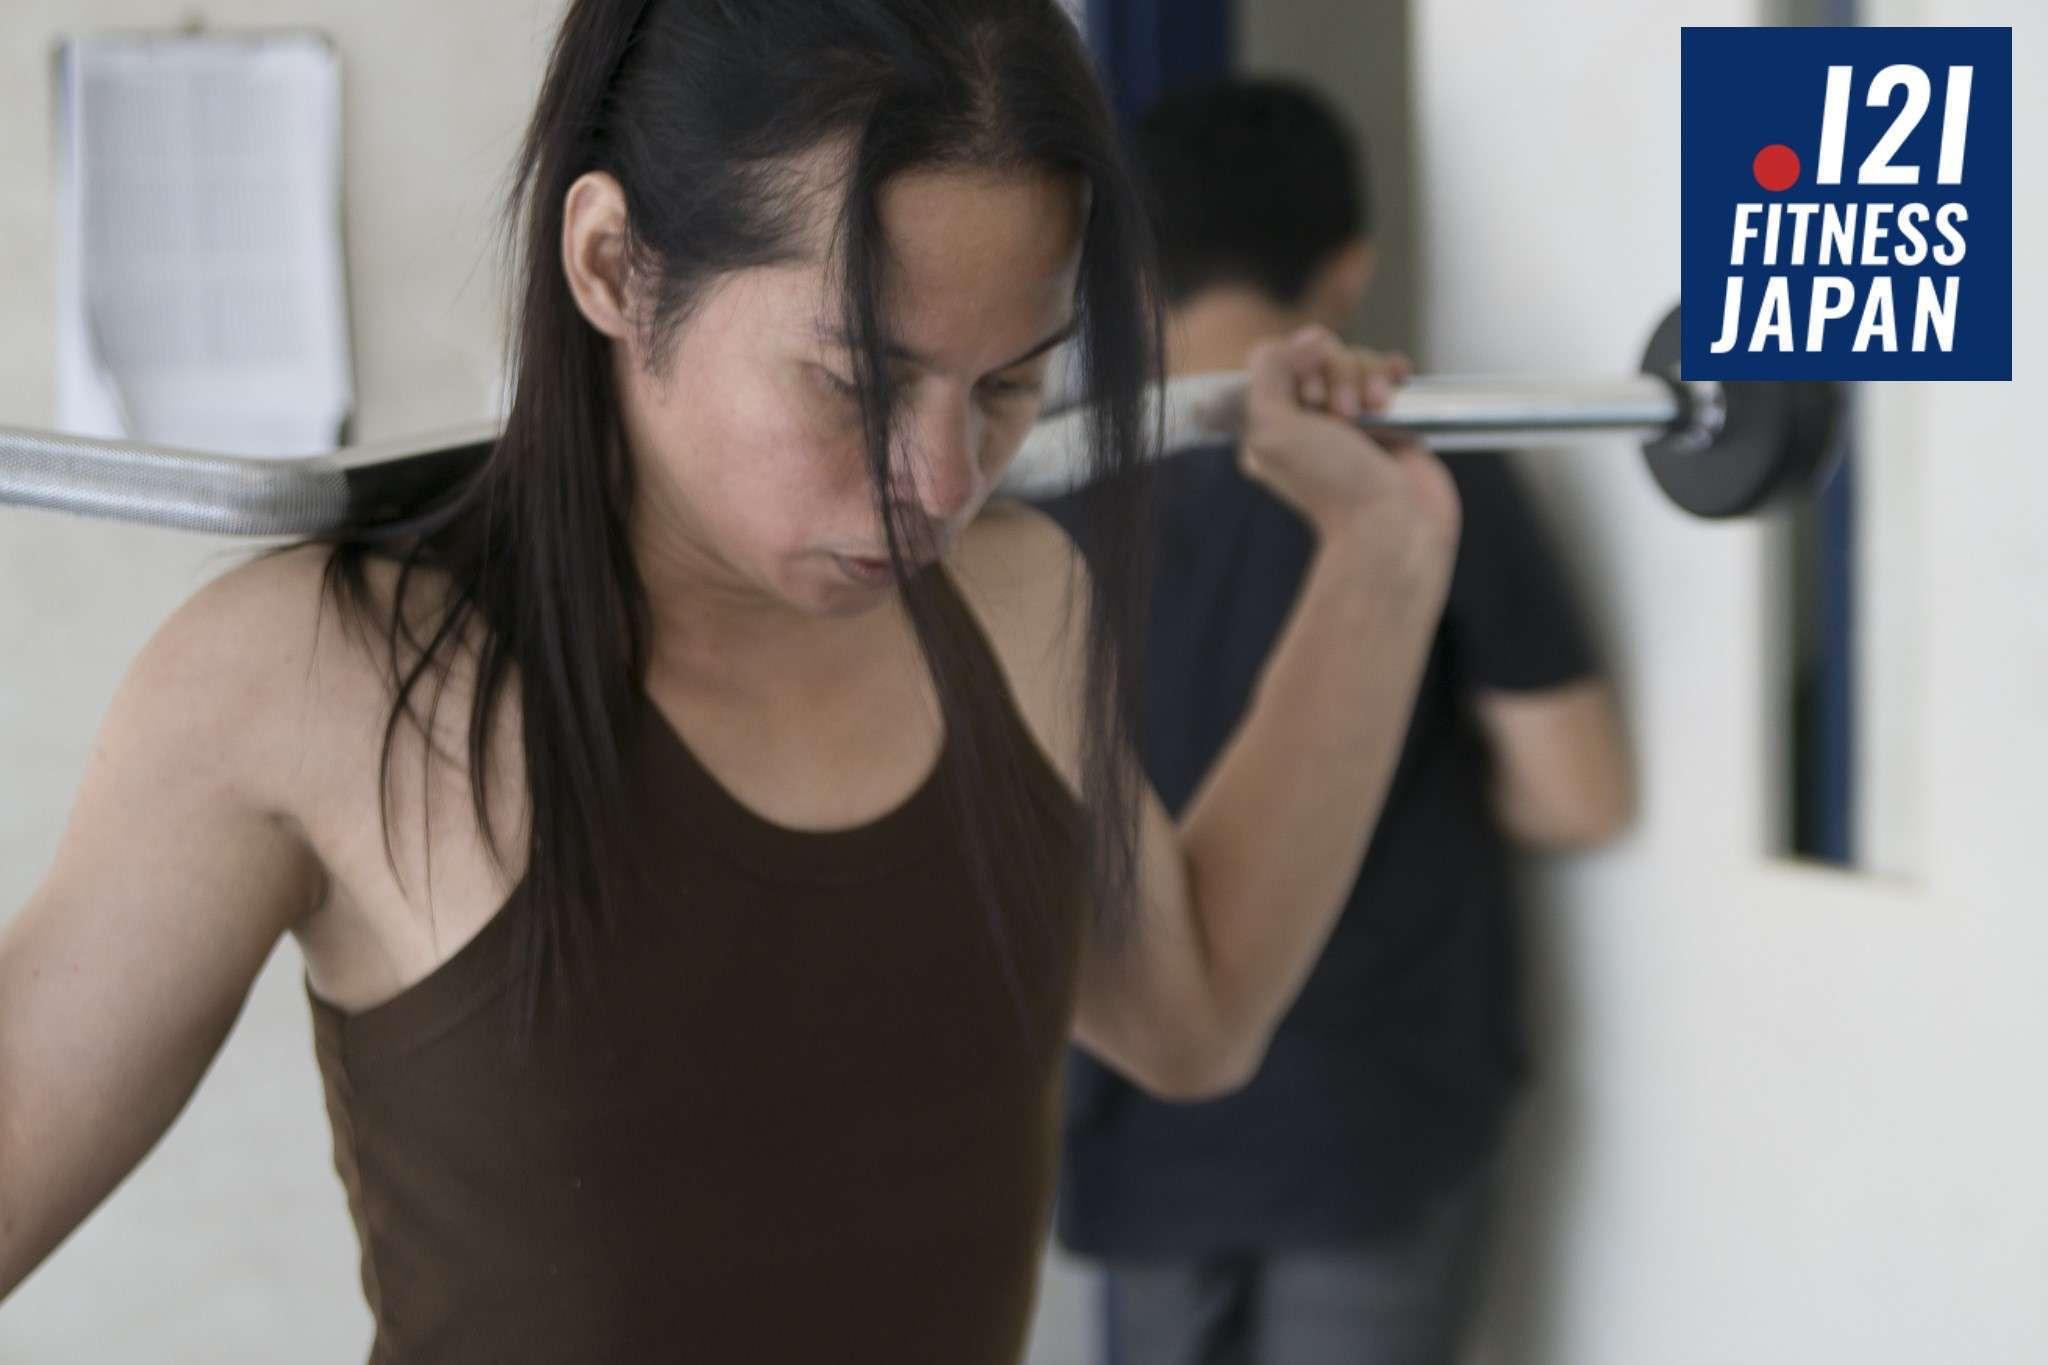 Fitness Japan